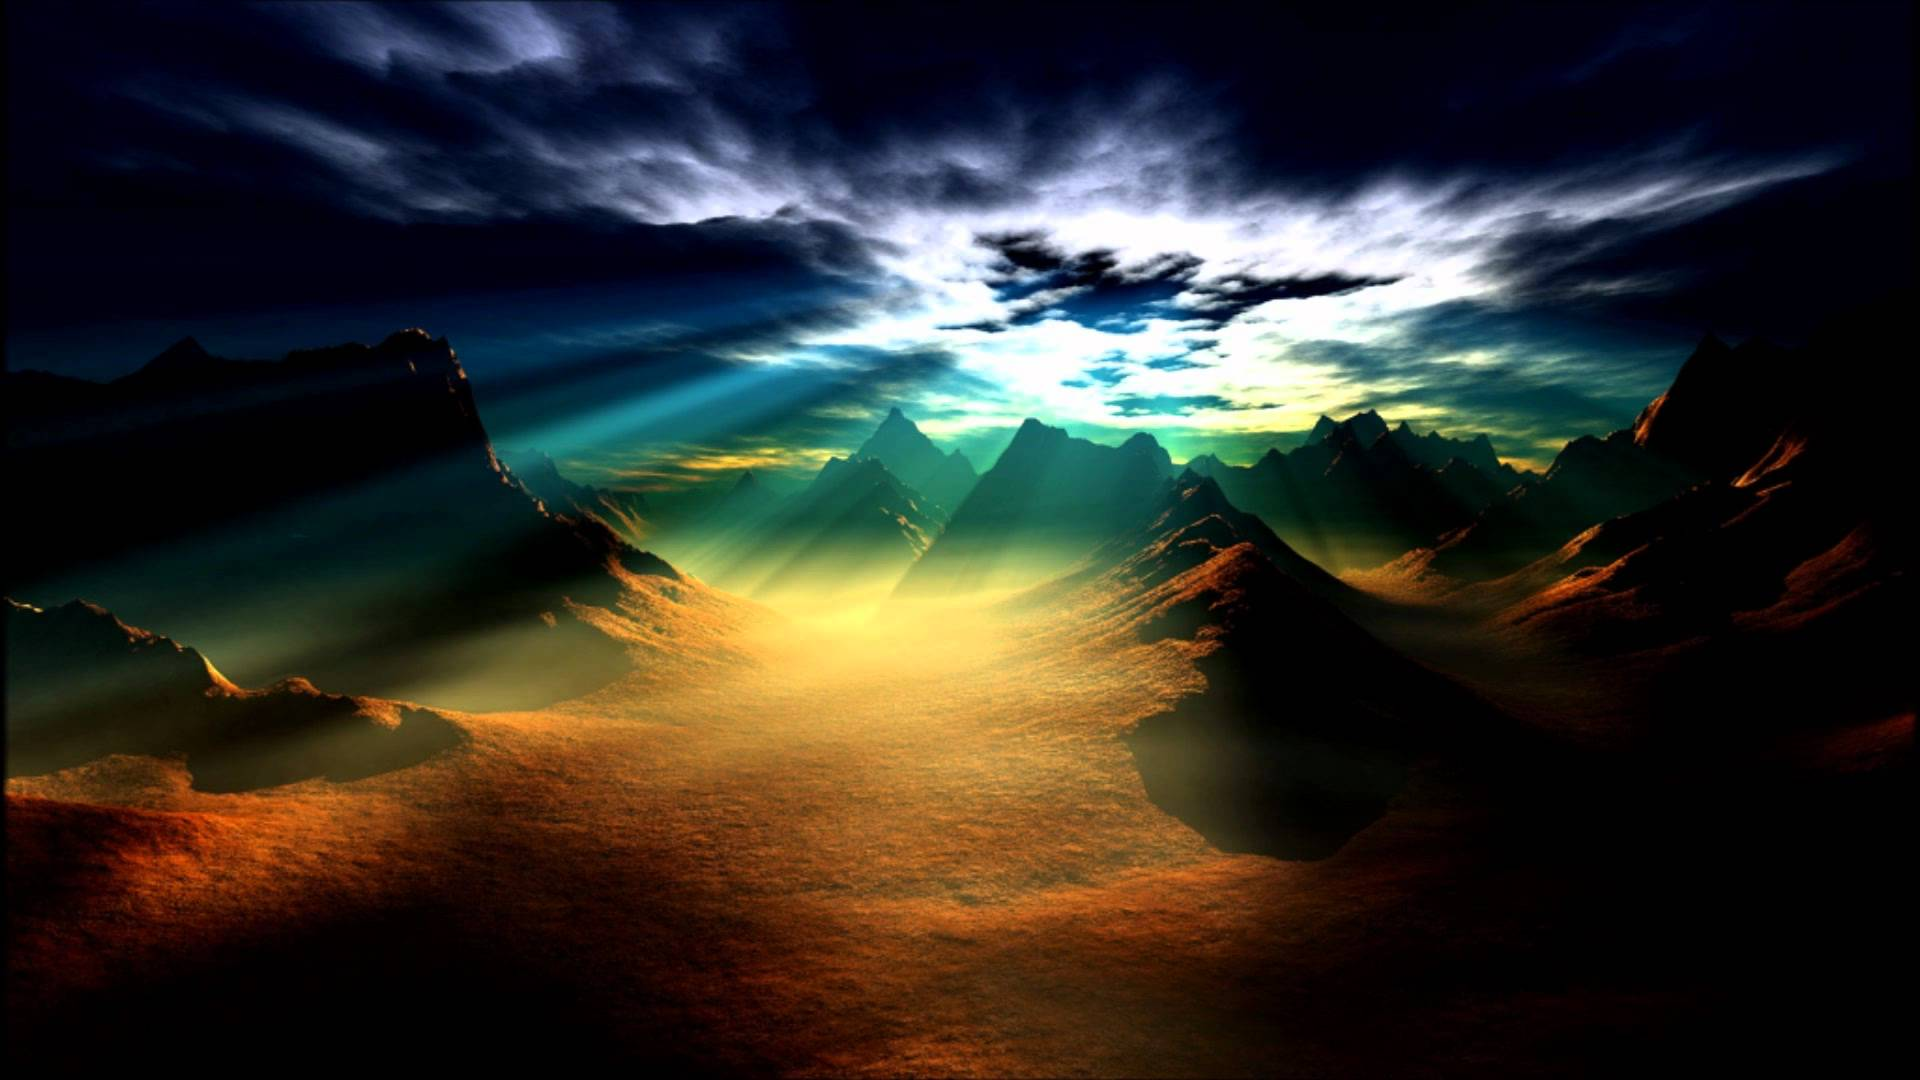 Knify - Mystical Landscape [Durtysoundz Dubstep]